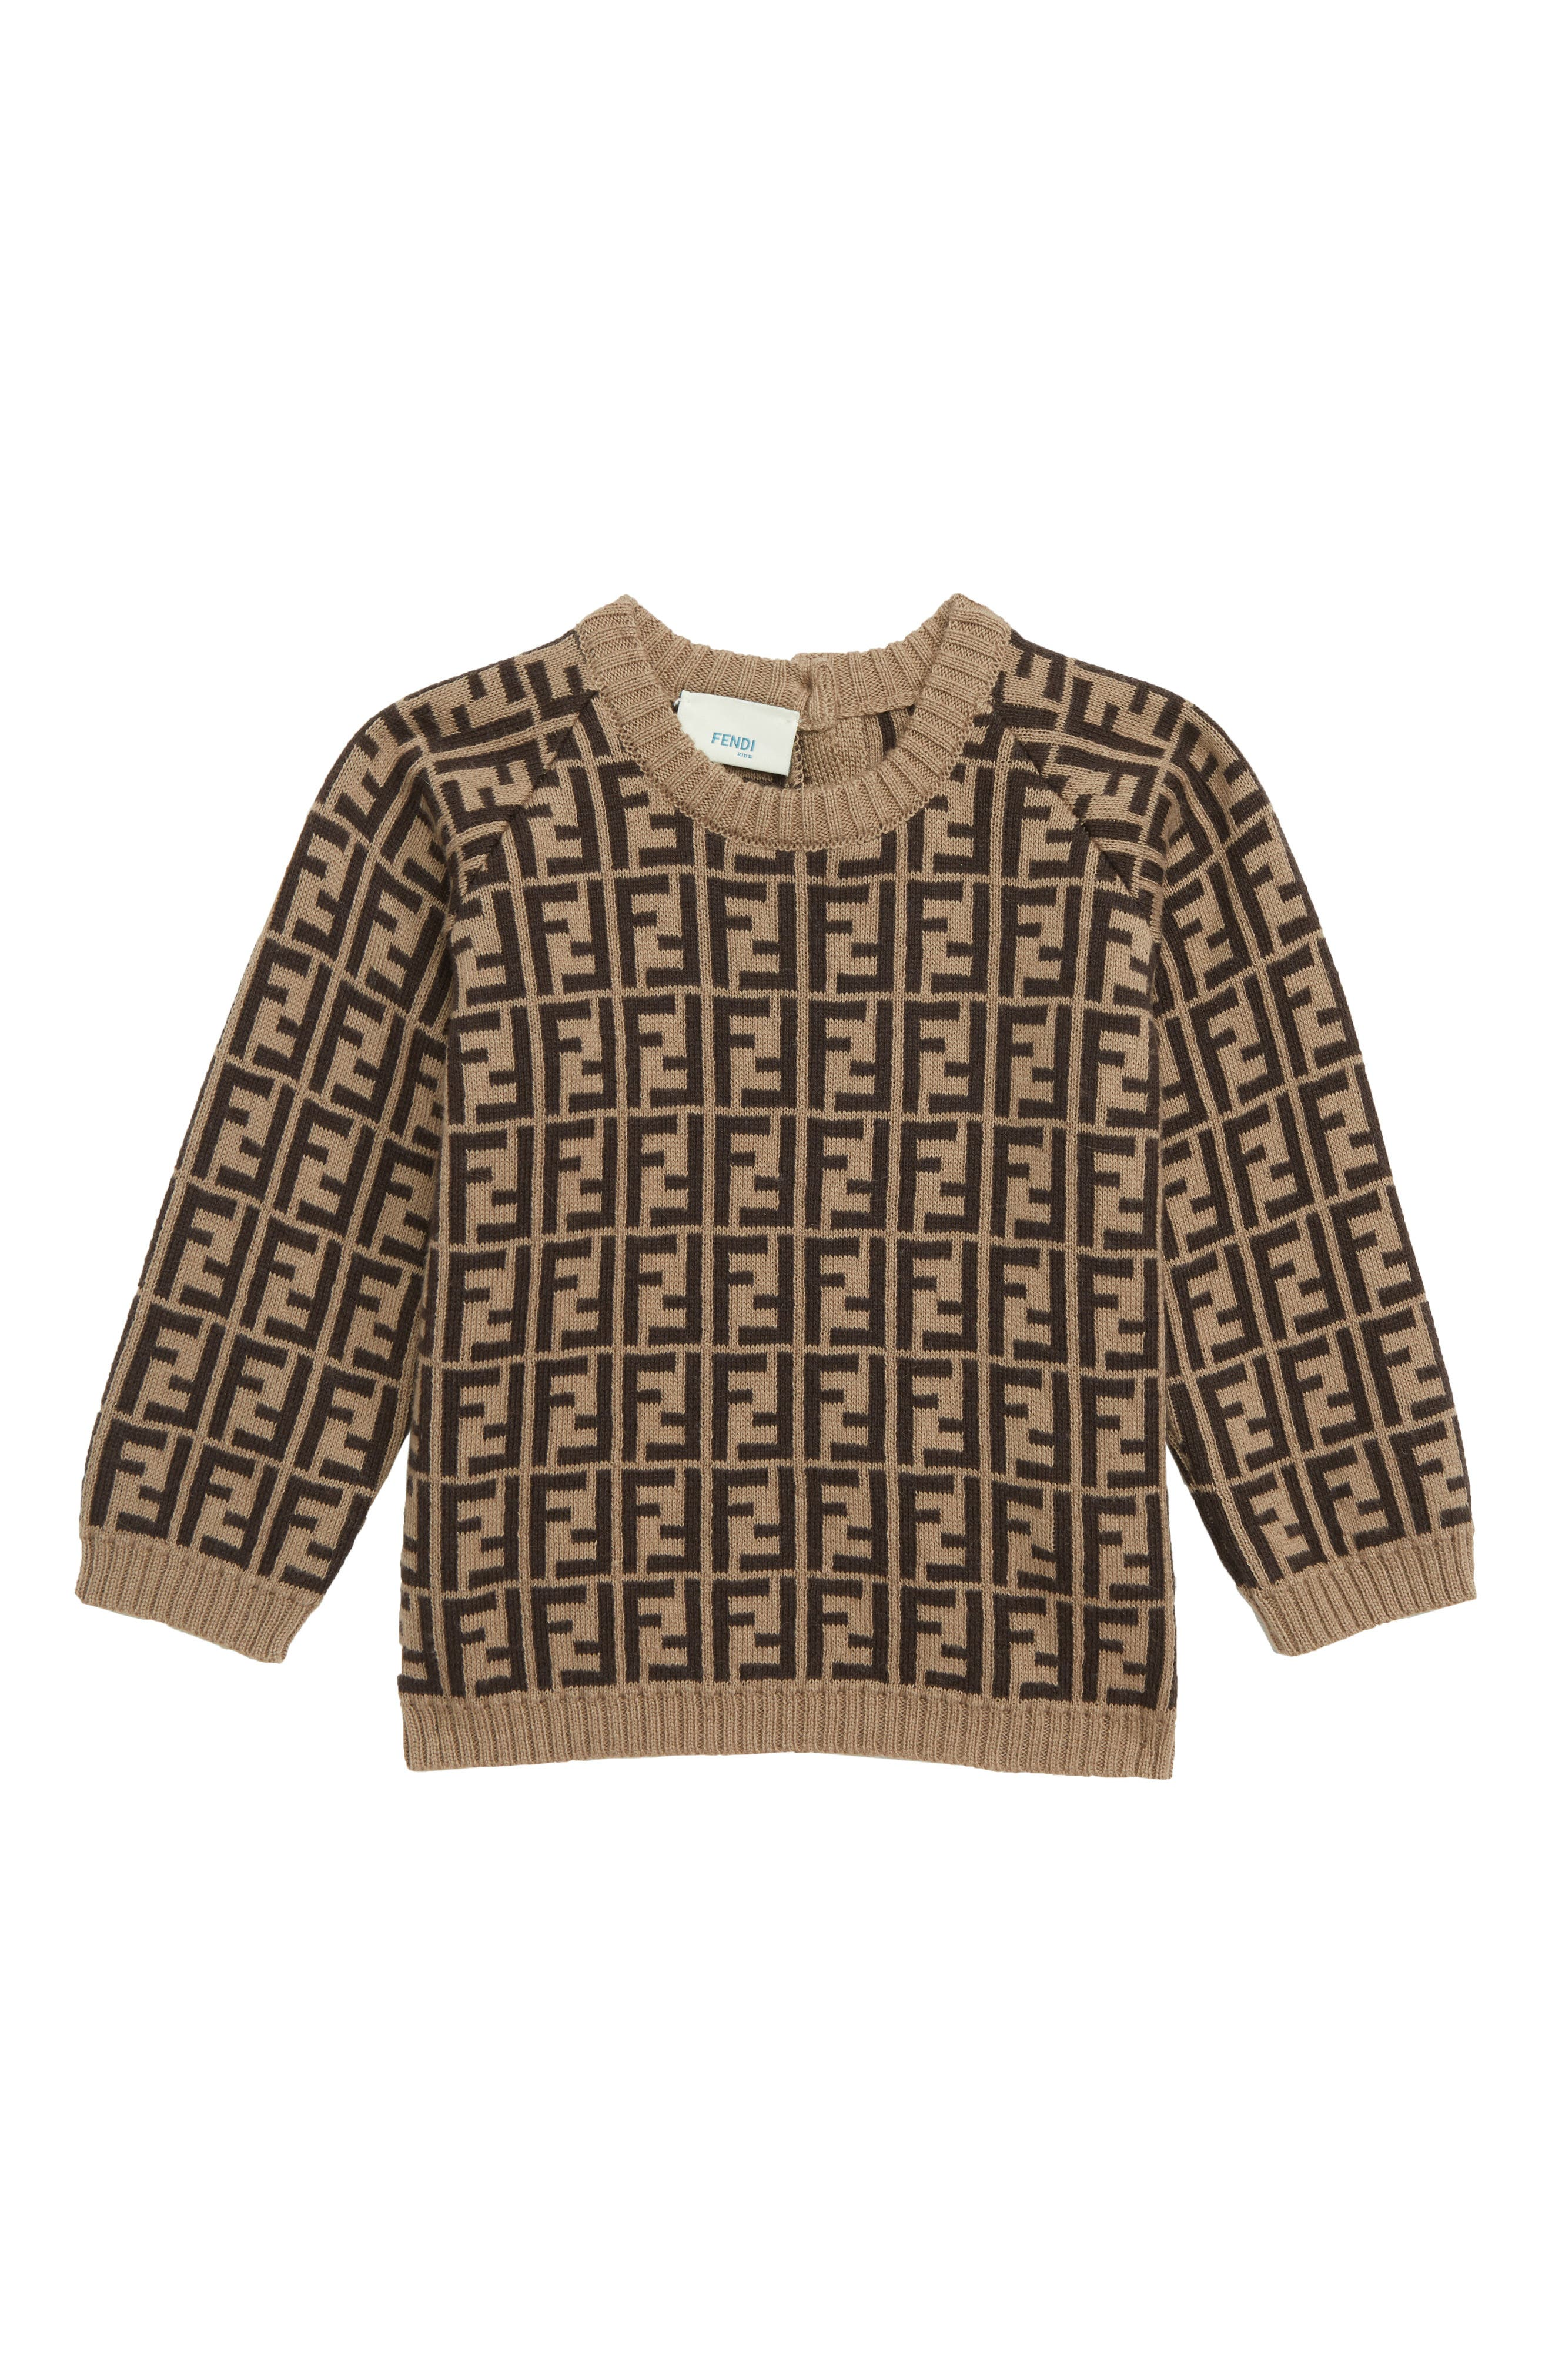 FENDI,                             Logo Sweater,                             Main thumbnail 1, color,                             F0LMJ BROWN